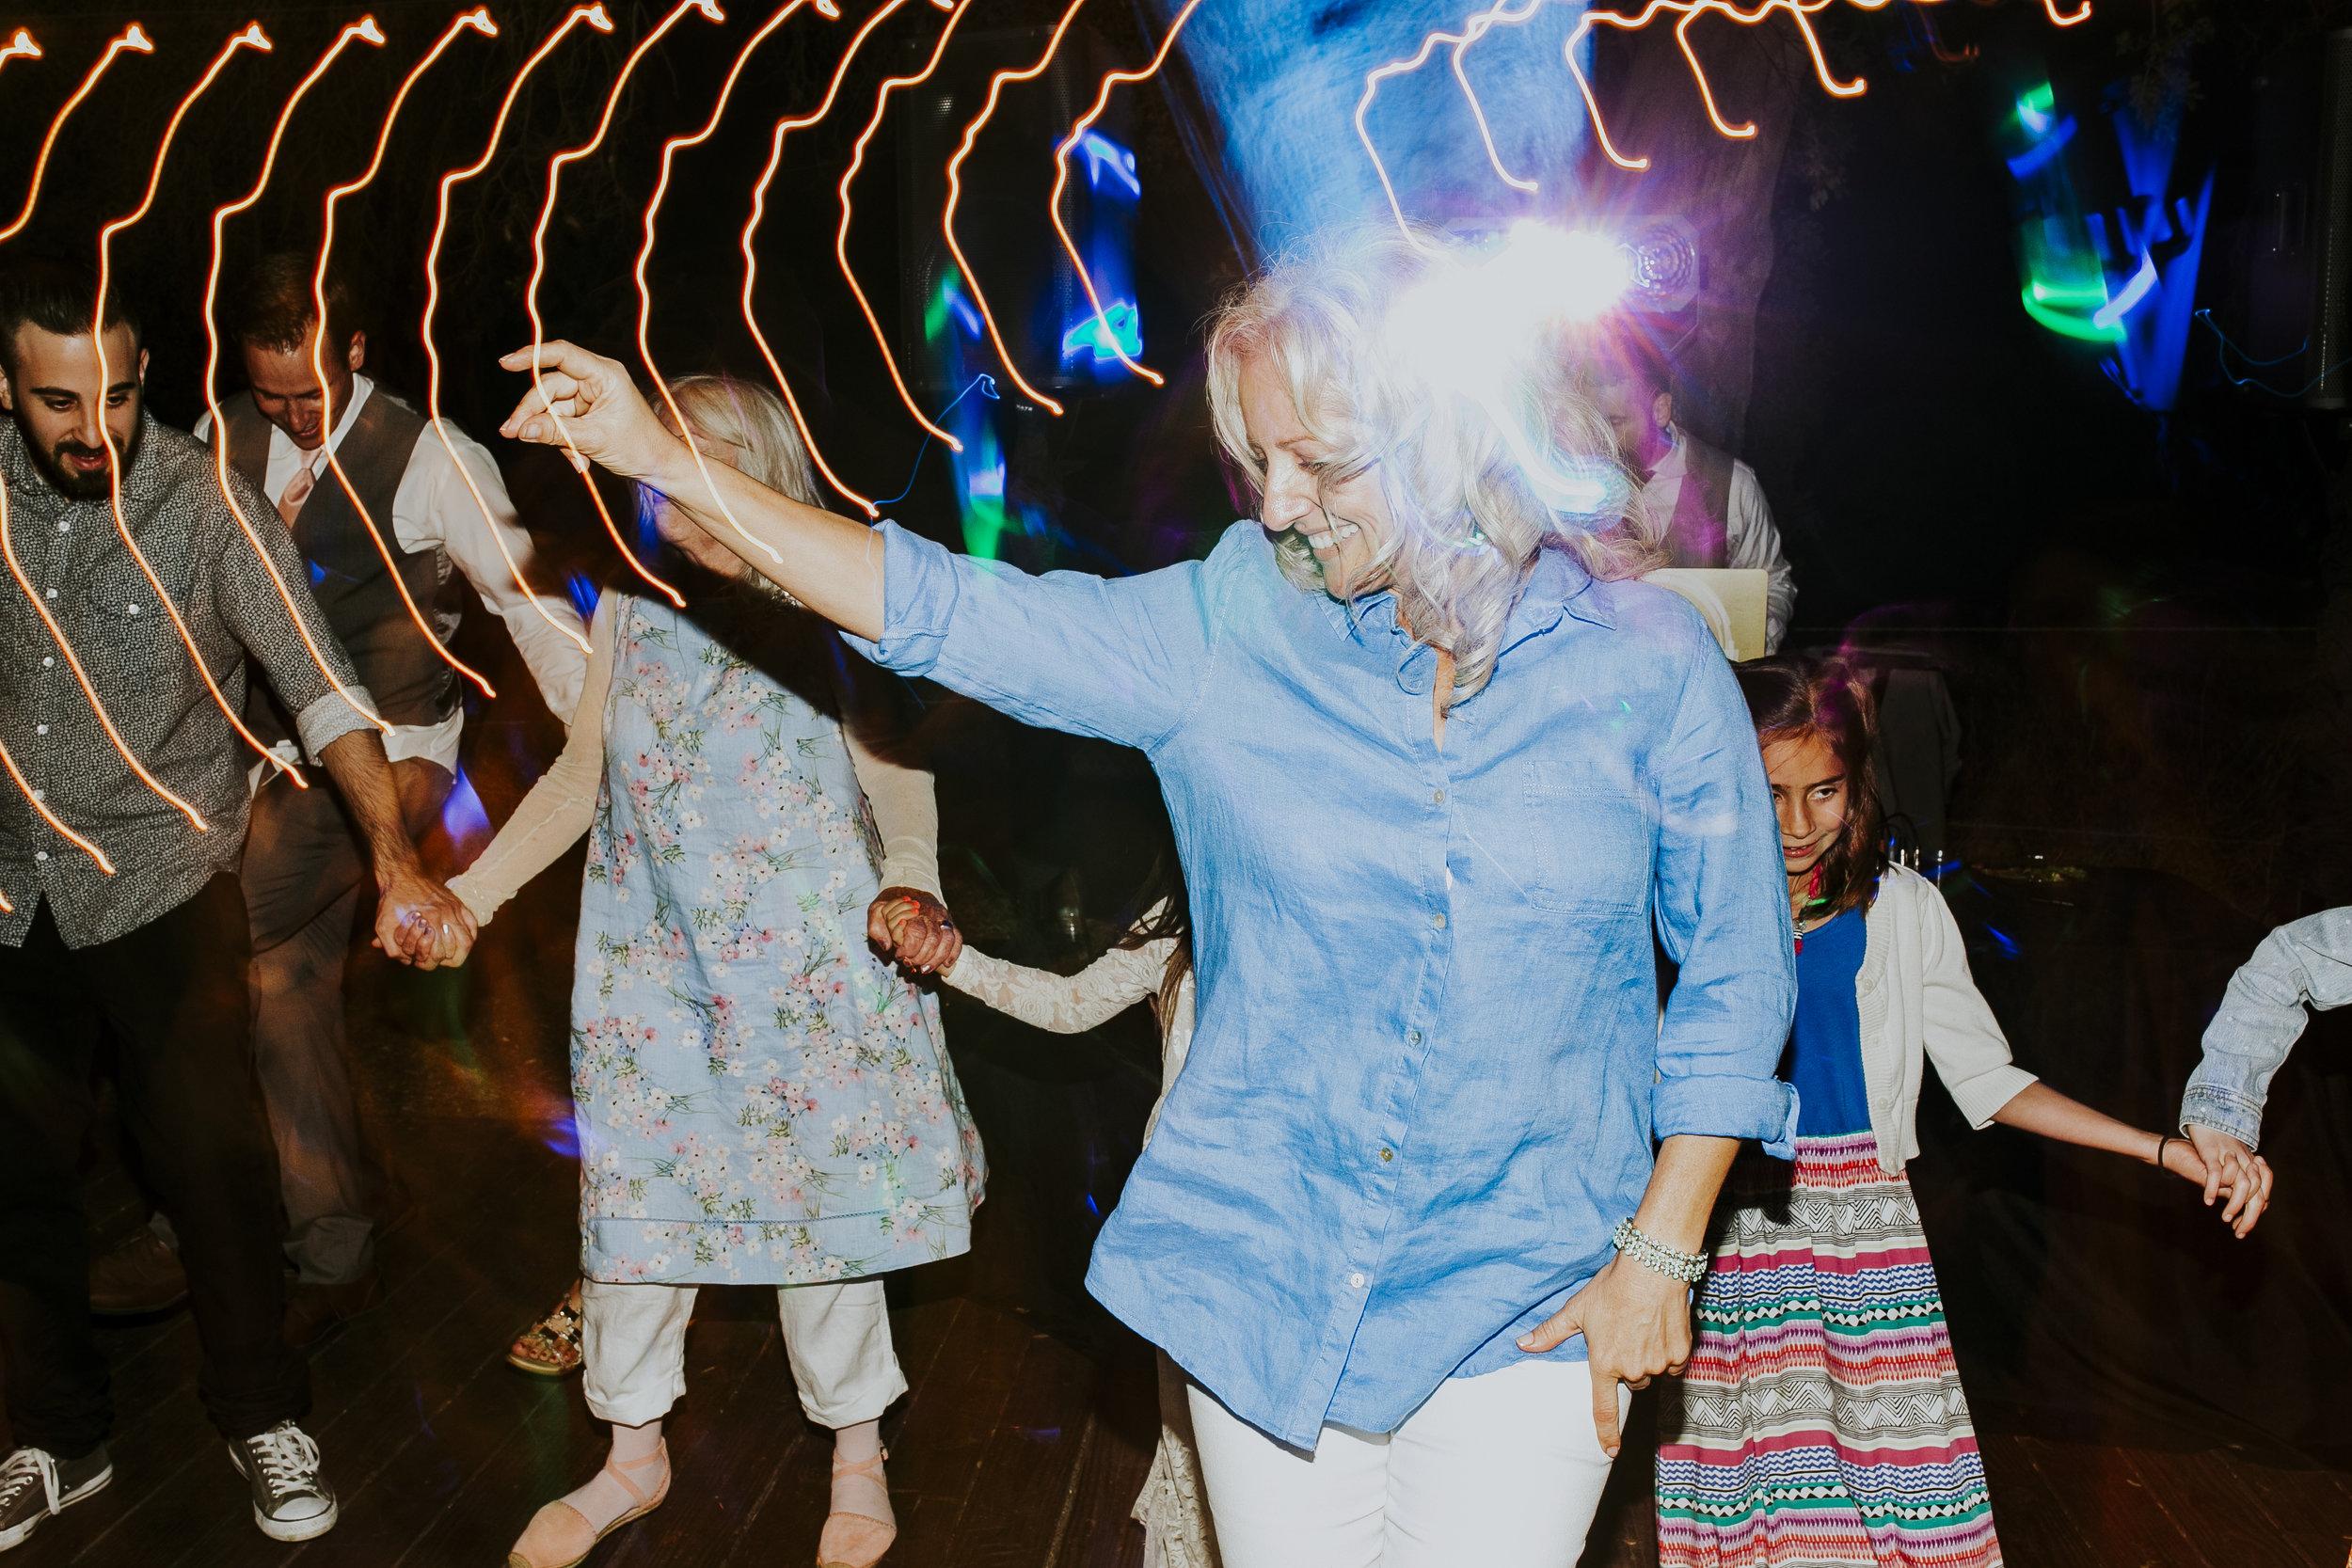 DANCE DANCE_1 (1).JPG